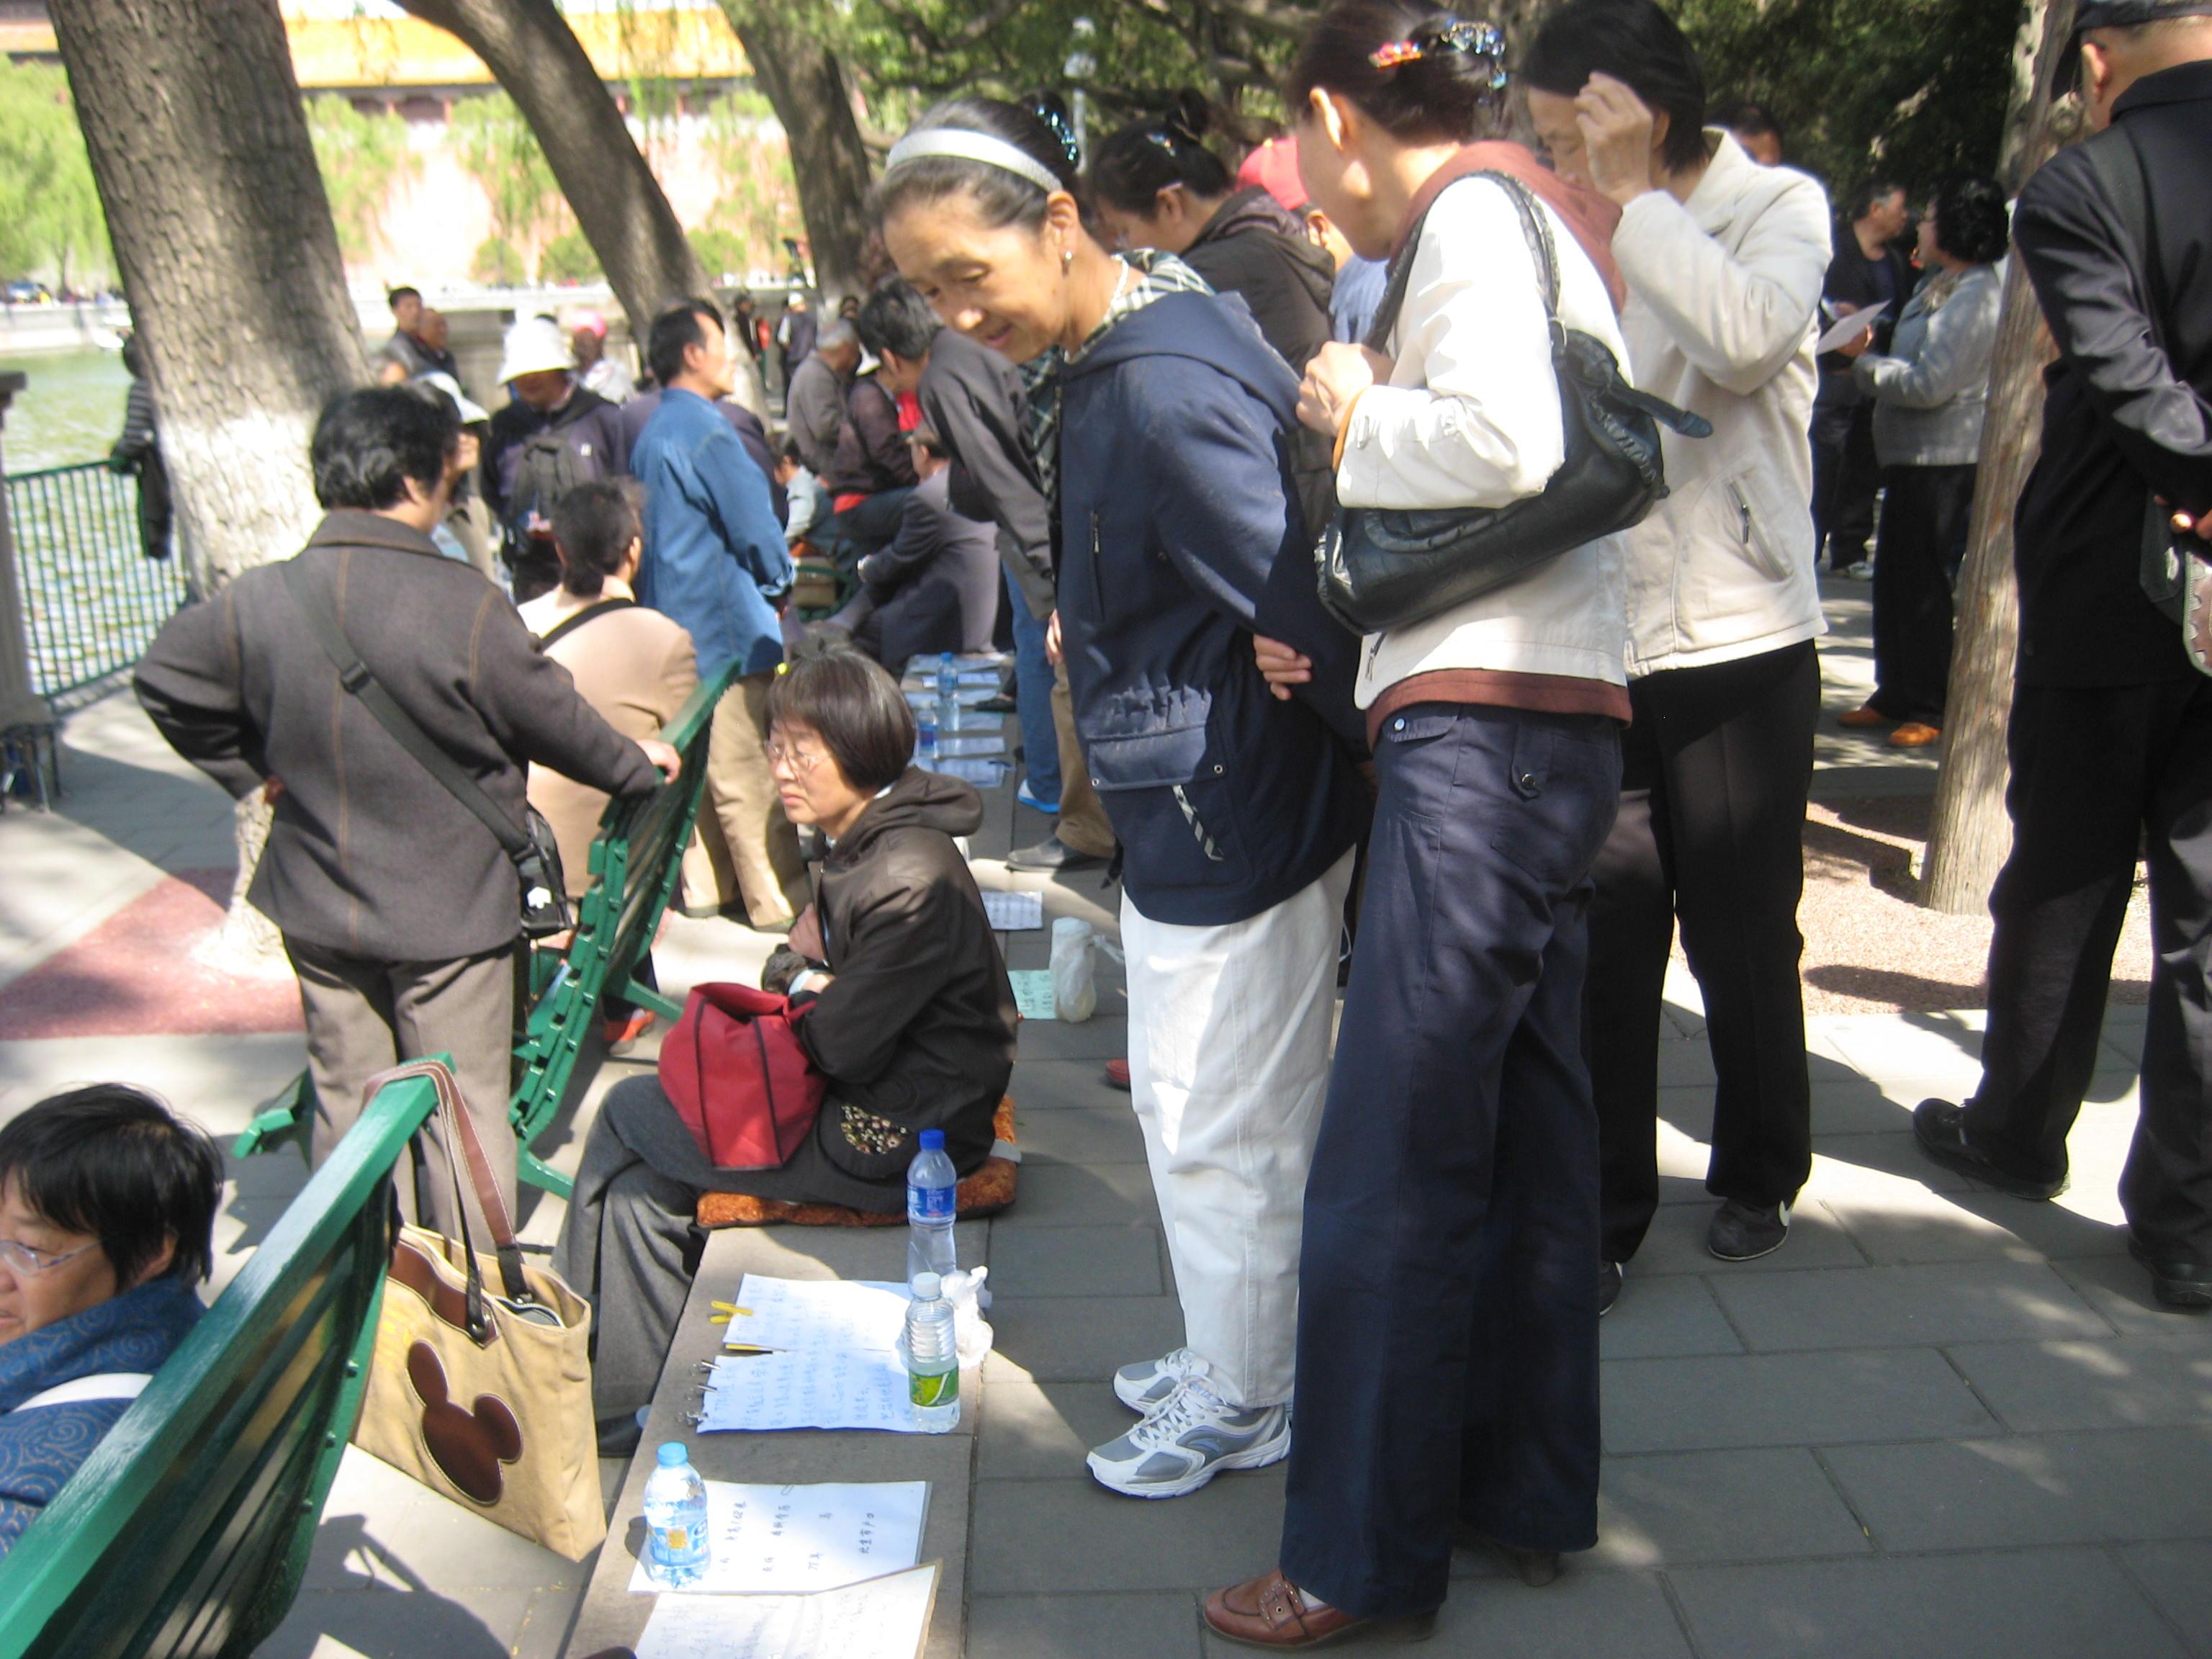 Zhongshan Park Peking matchmaking hastighet dating fabeln